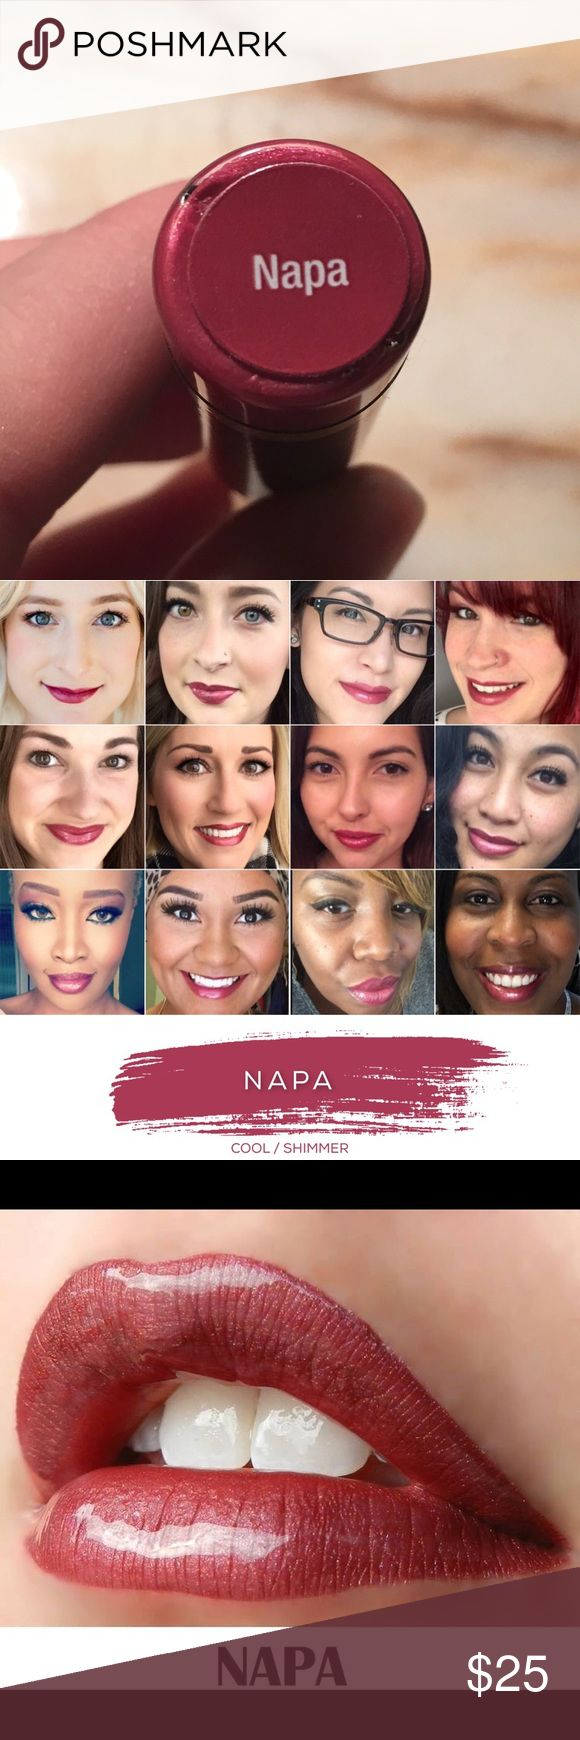 LipSense NAPA Best-Selling Waterproof Lipstick Brand new, sealed LipSense waterproof, smudge-proof, smear-proof, kiss-proof, gluten-free, lead-free & vegan lipstick in Napa! LipSense Makeup Lipstick